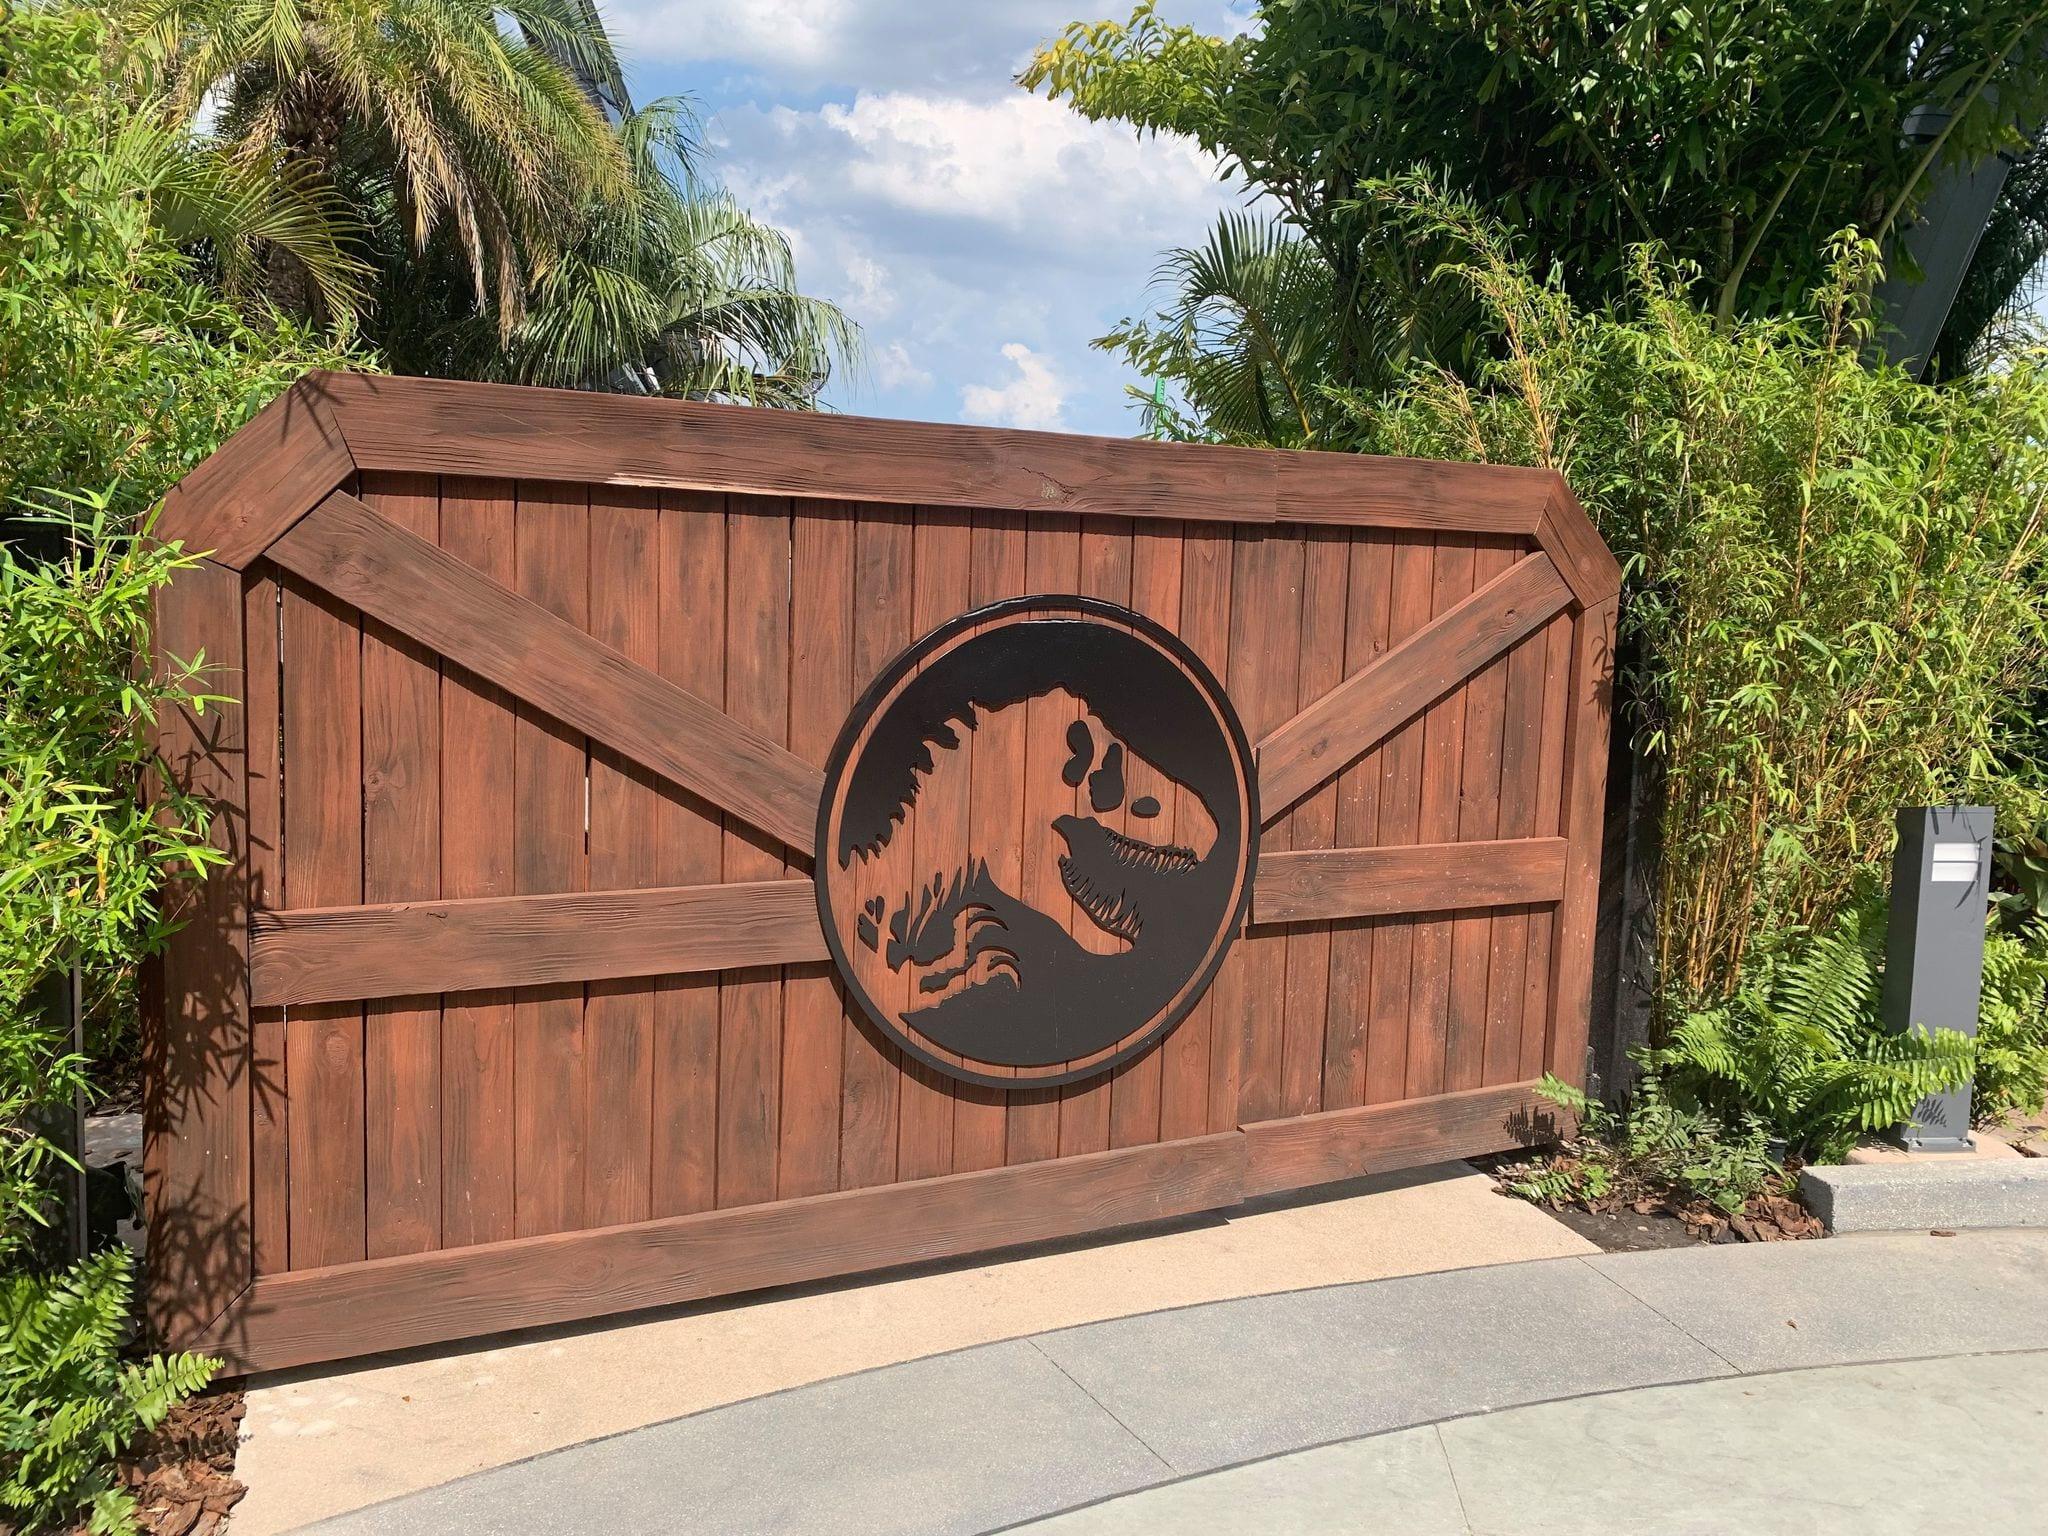 Velocicoaster, Universal Studios, Jurassic Park, Jurassic World